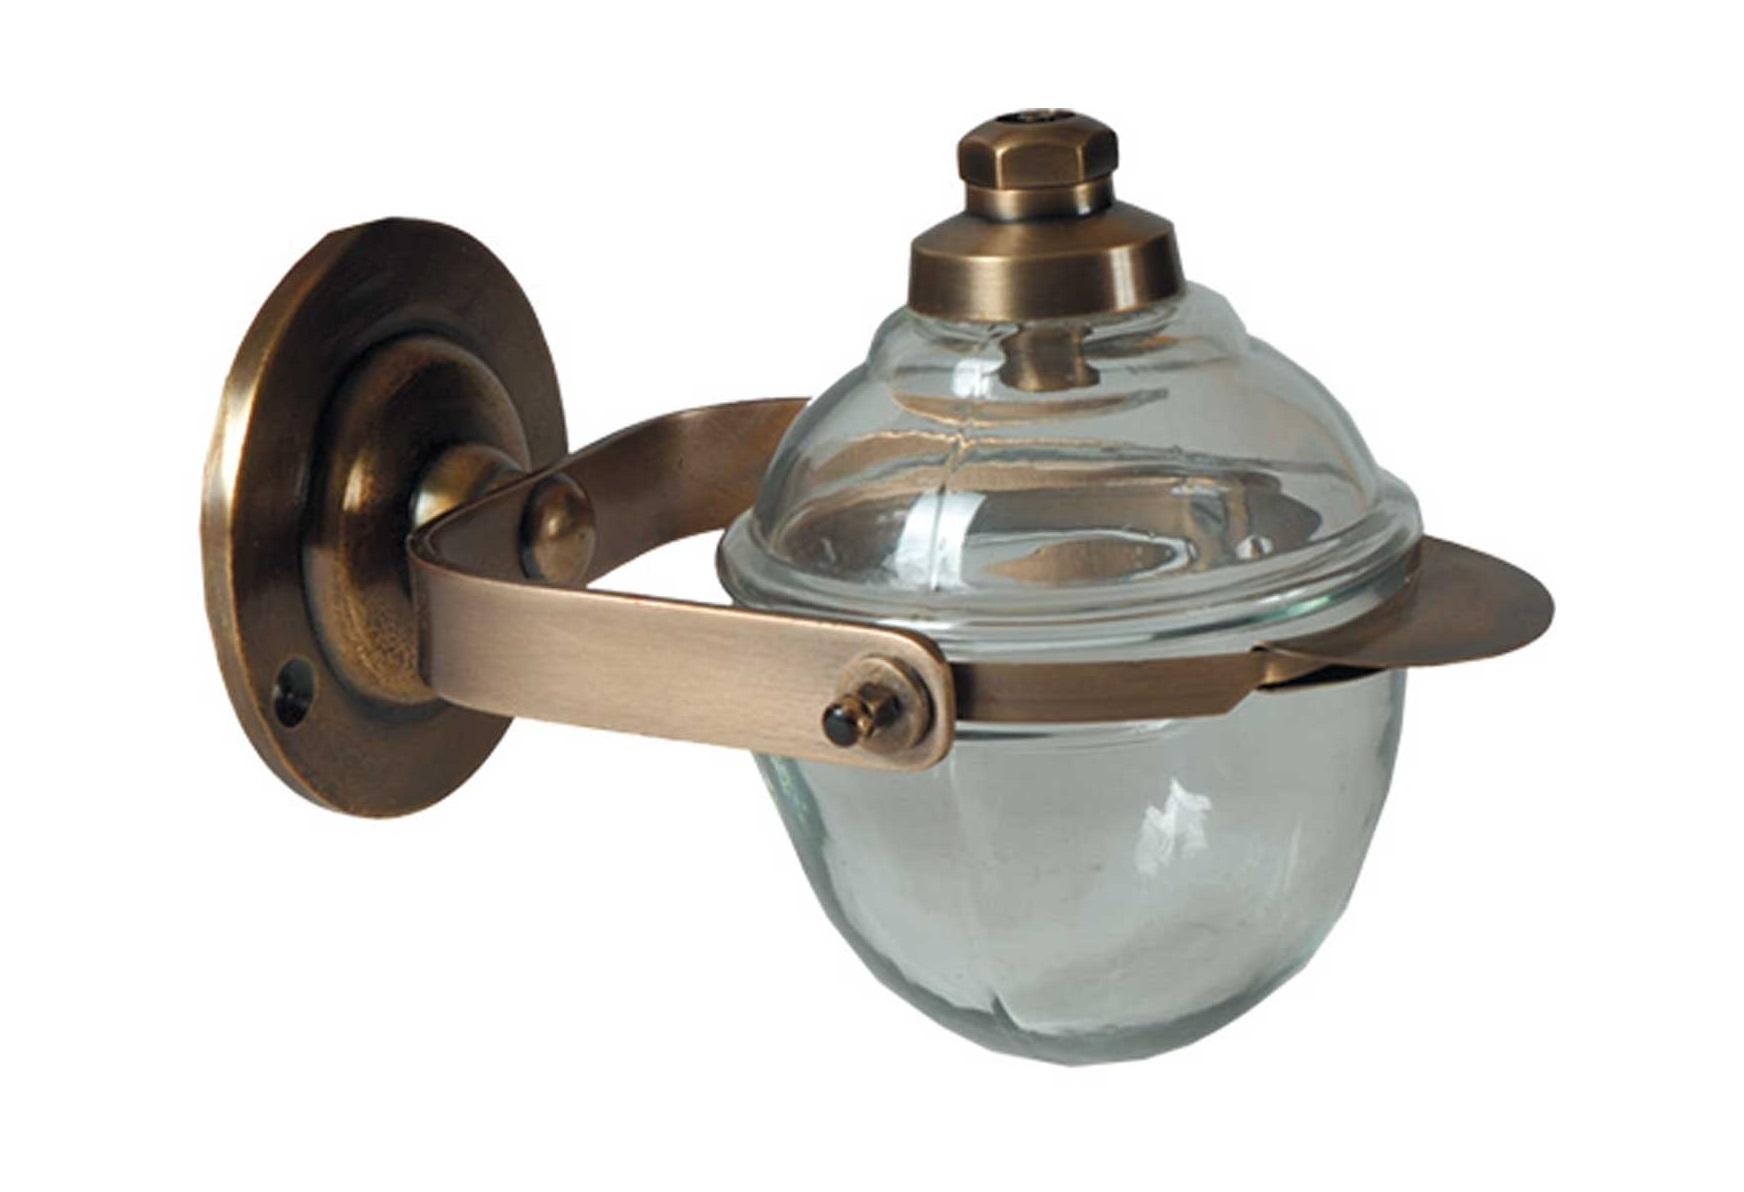 Дозатор для мылаАксессуары для ванной<br><br><br>Material: Латунь<br>Width см: None<br>Depth см: None<br>Height см: 18<br>Diameter см: 13